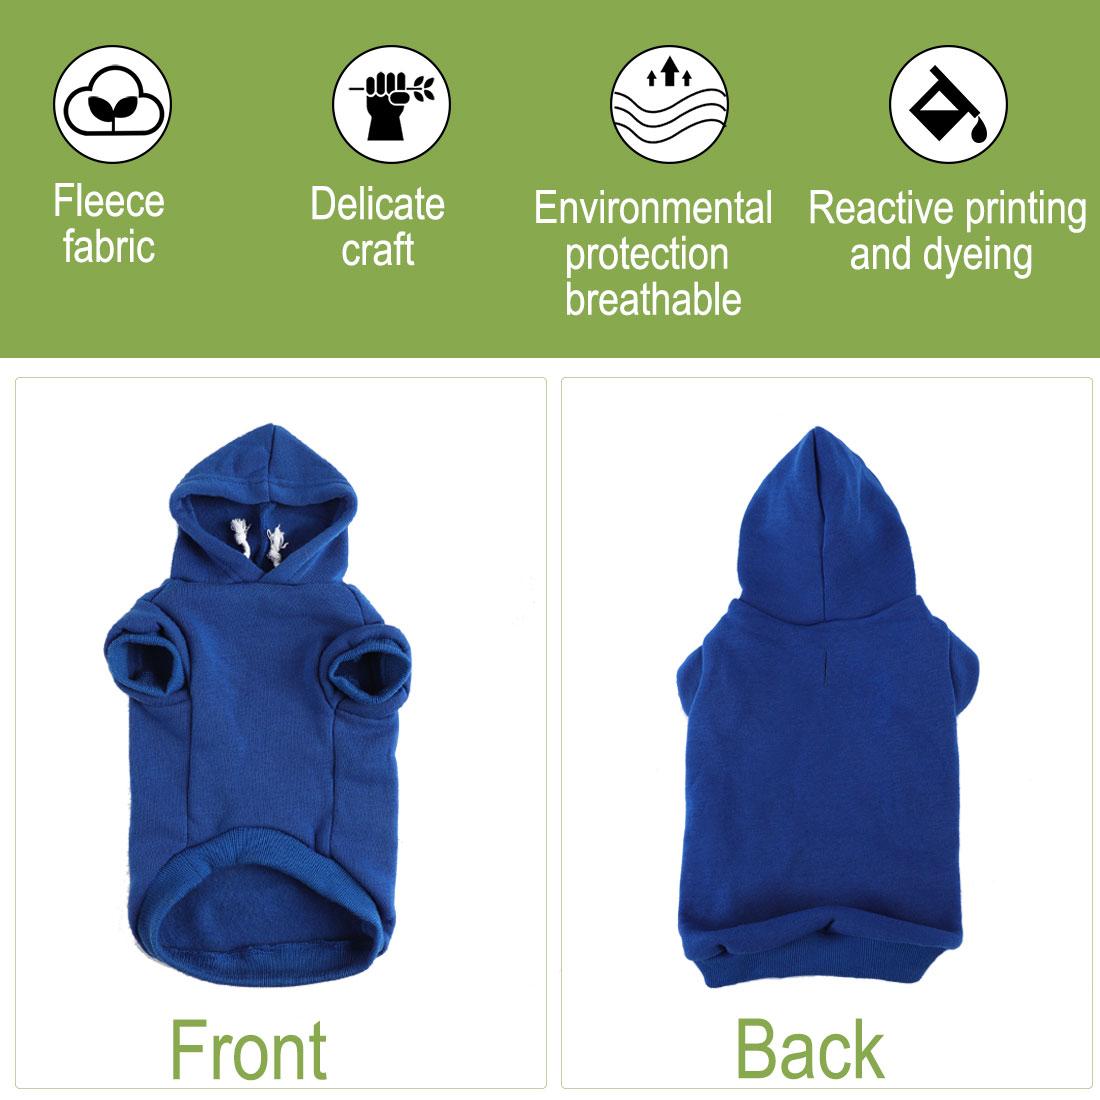 Cotton Dog Winter/Spring/Fall Sweatshirt Hoody Pet Clothes Warm Coat Blue M - image 3 of 7